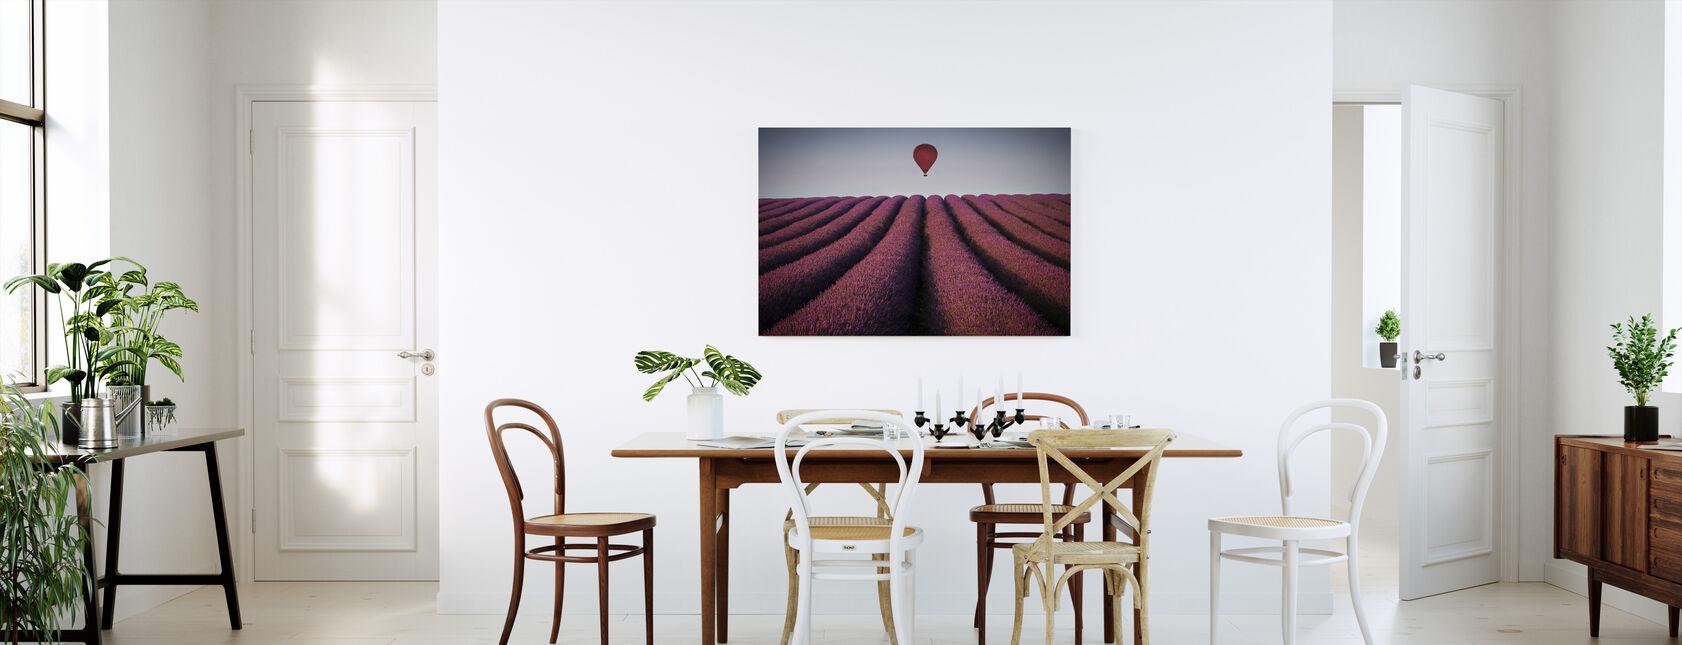 Flying High - Canvas print - Kitchen